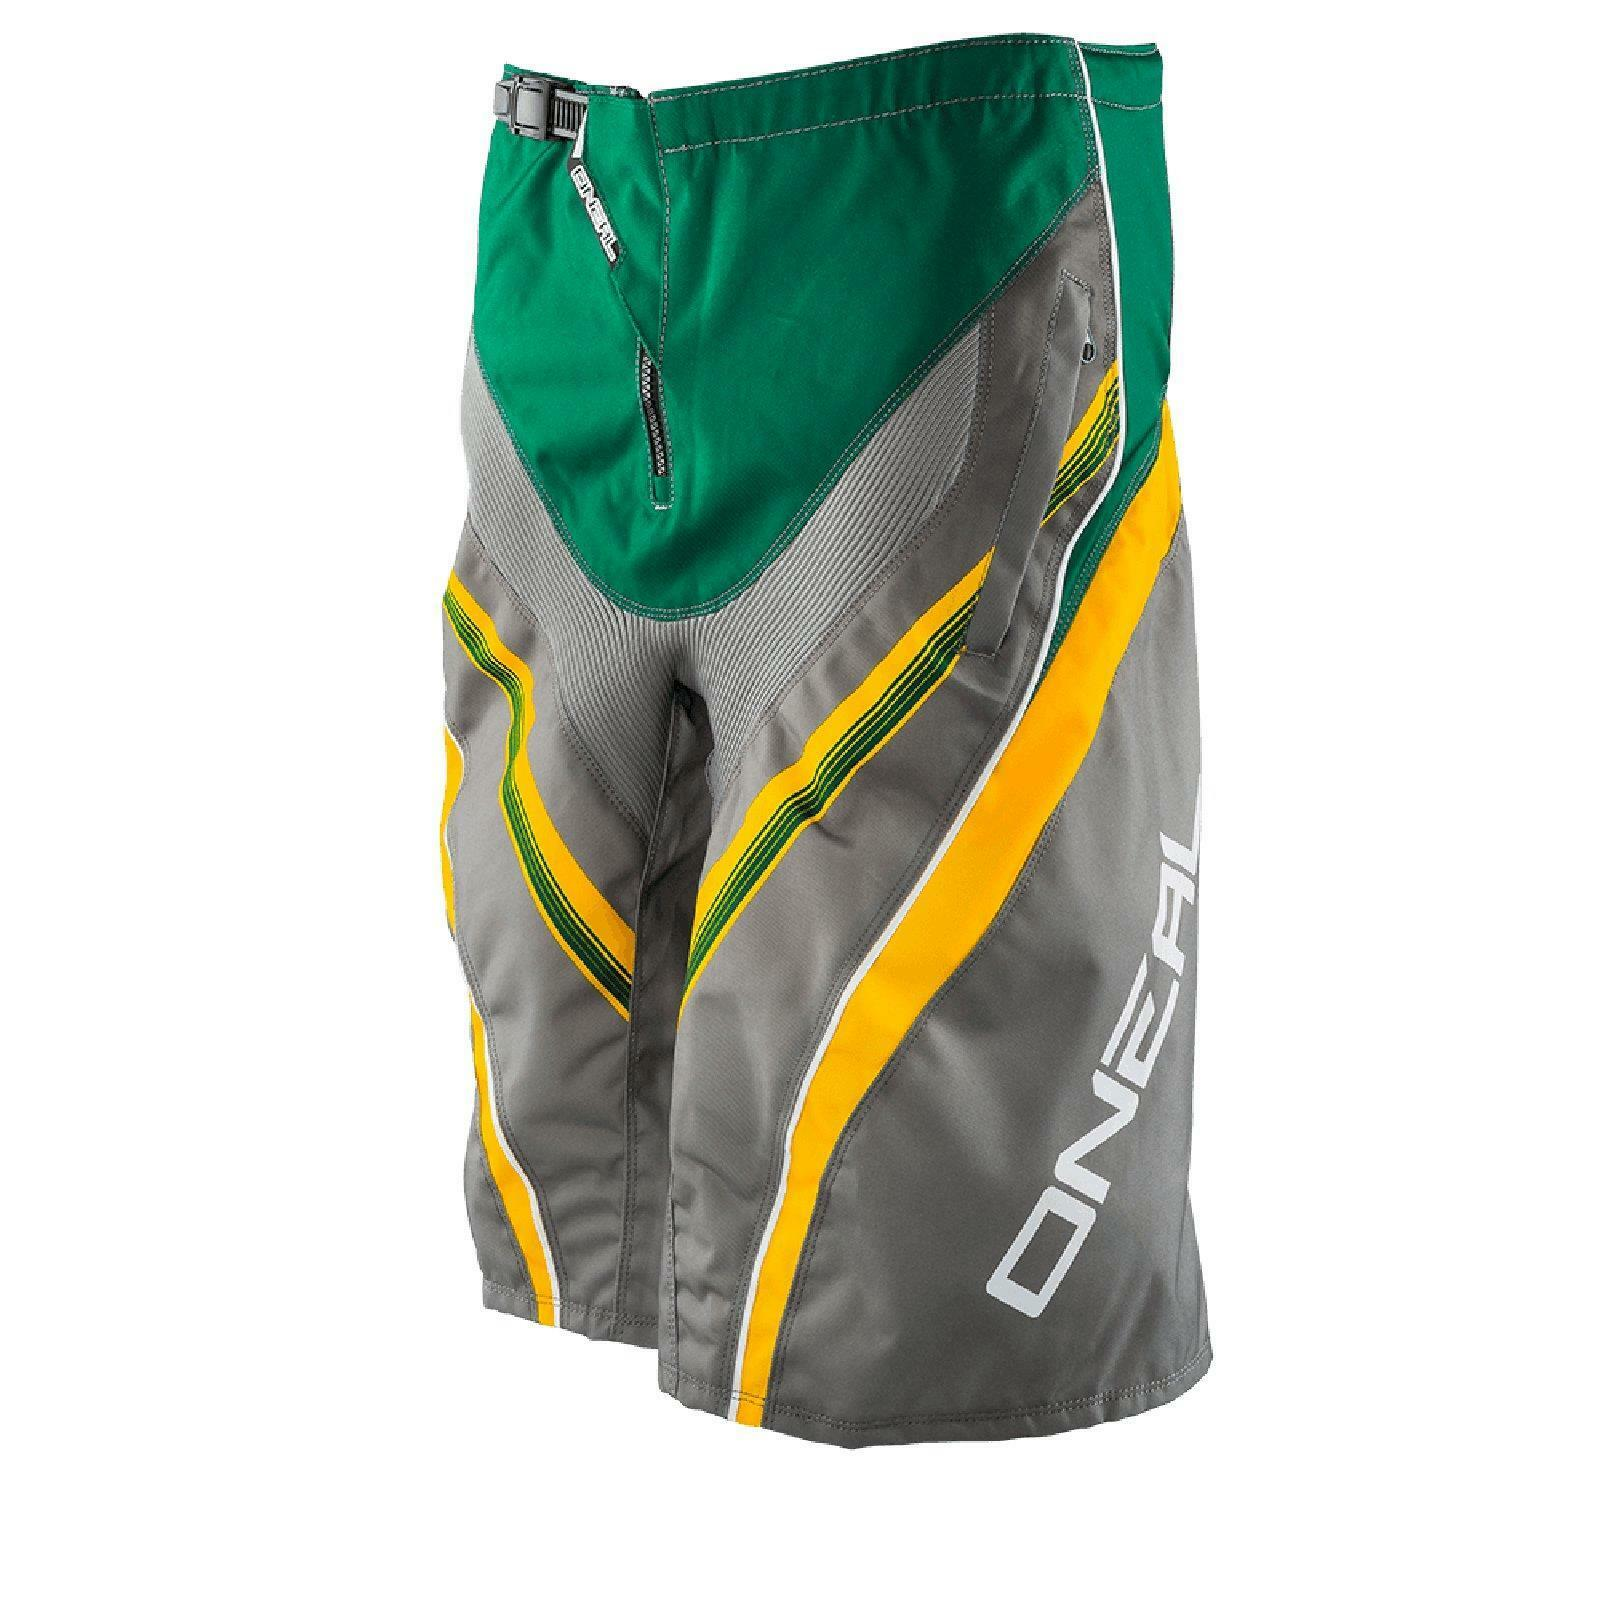 ONeal Element FR Short green grey Downhill MTB Freeride Mountainbike Fahrrad Hose